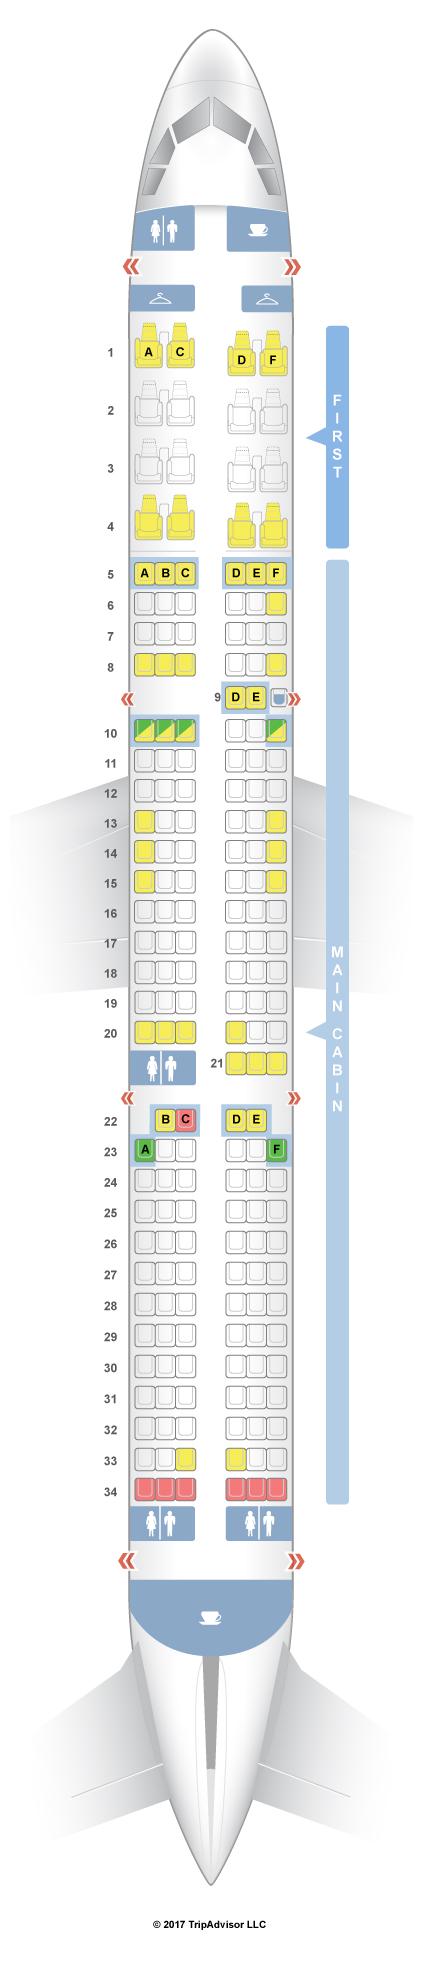 Seatguru Seat Map American Airlines Airbus A321 321 V3